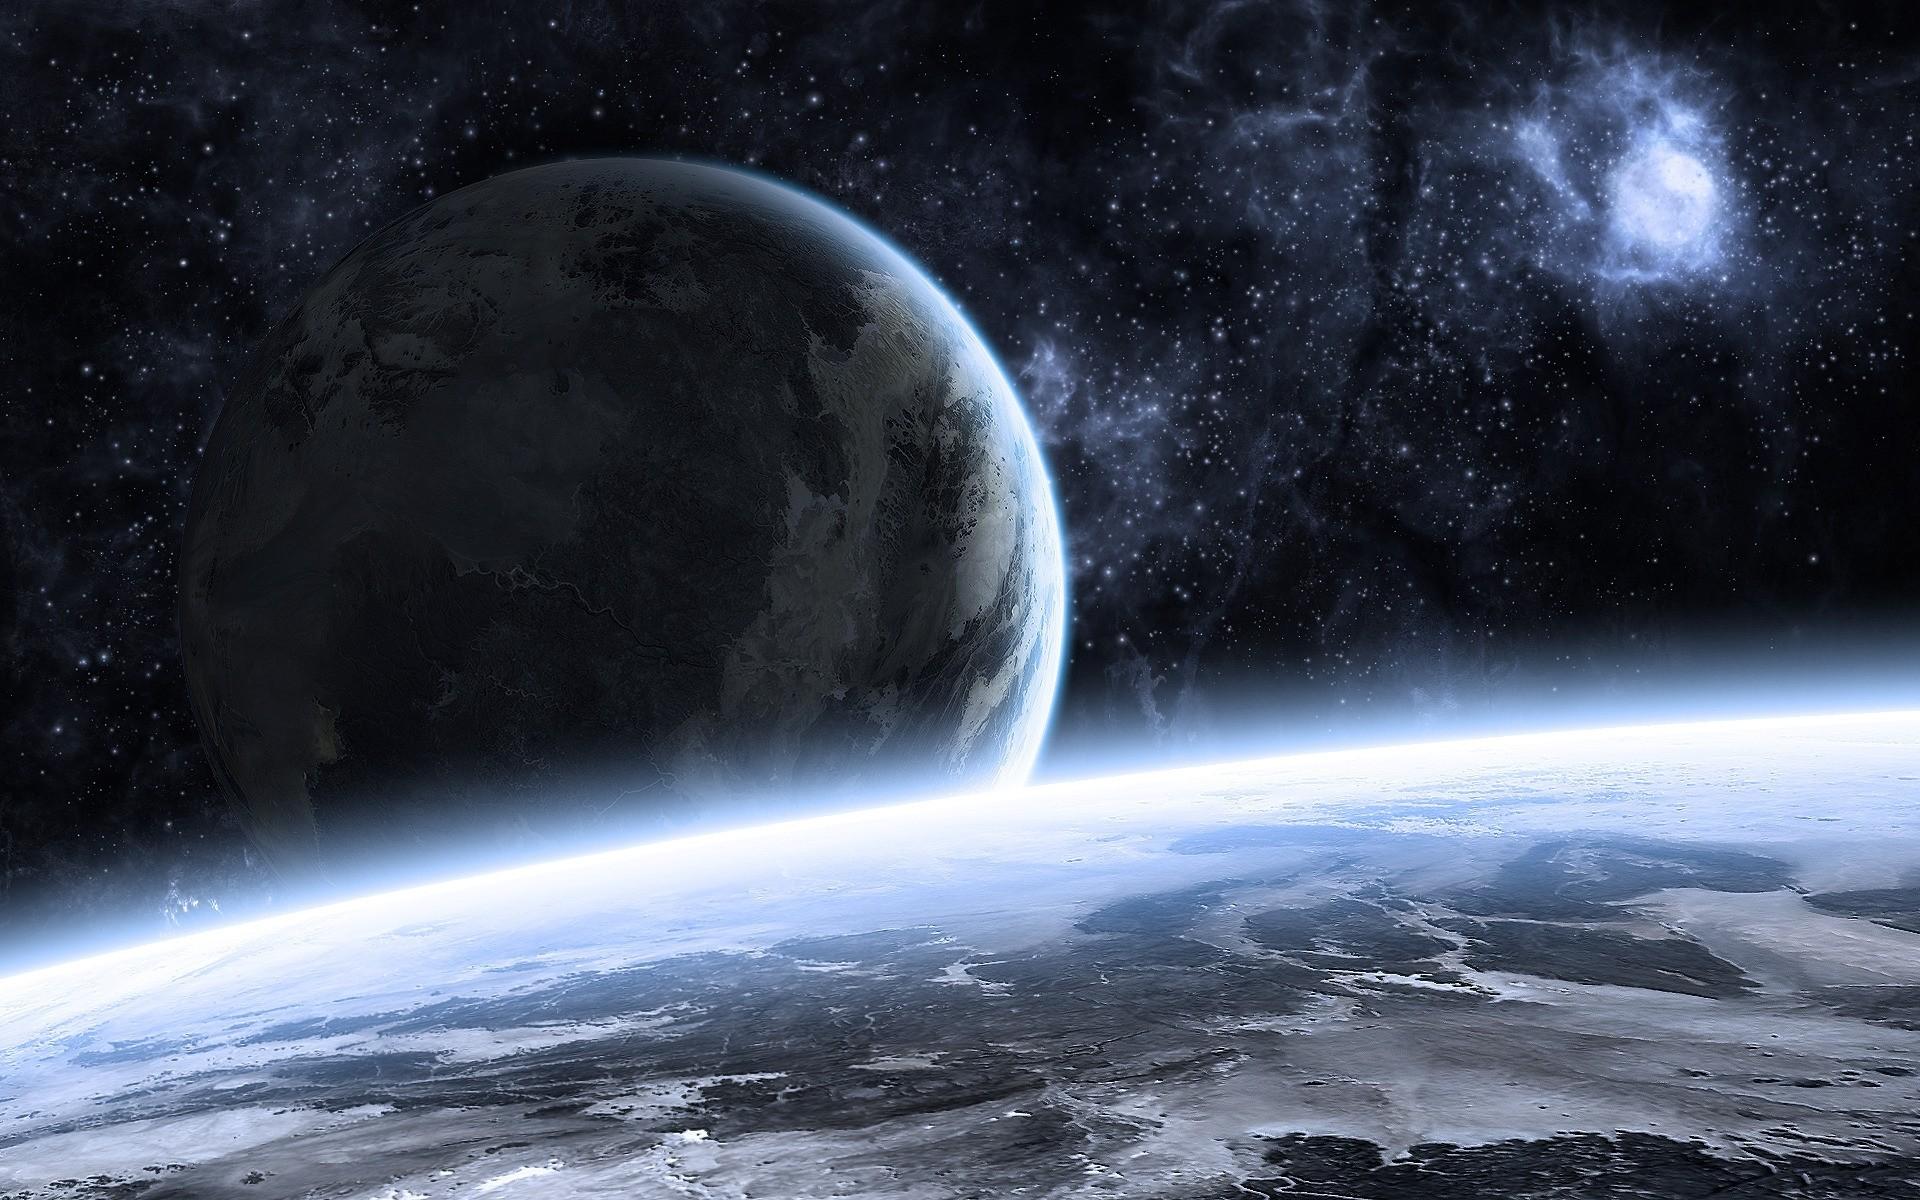 Aerospace Full Hd Cool Earth Wallpaper Space Wallpaper - Beautiful Space Landscape , HD Wallpaper & Backgrounds